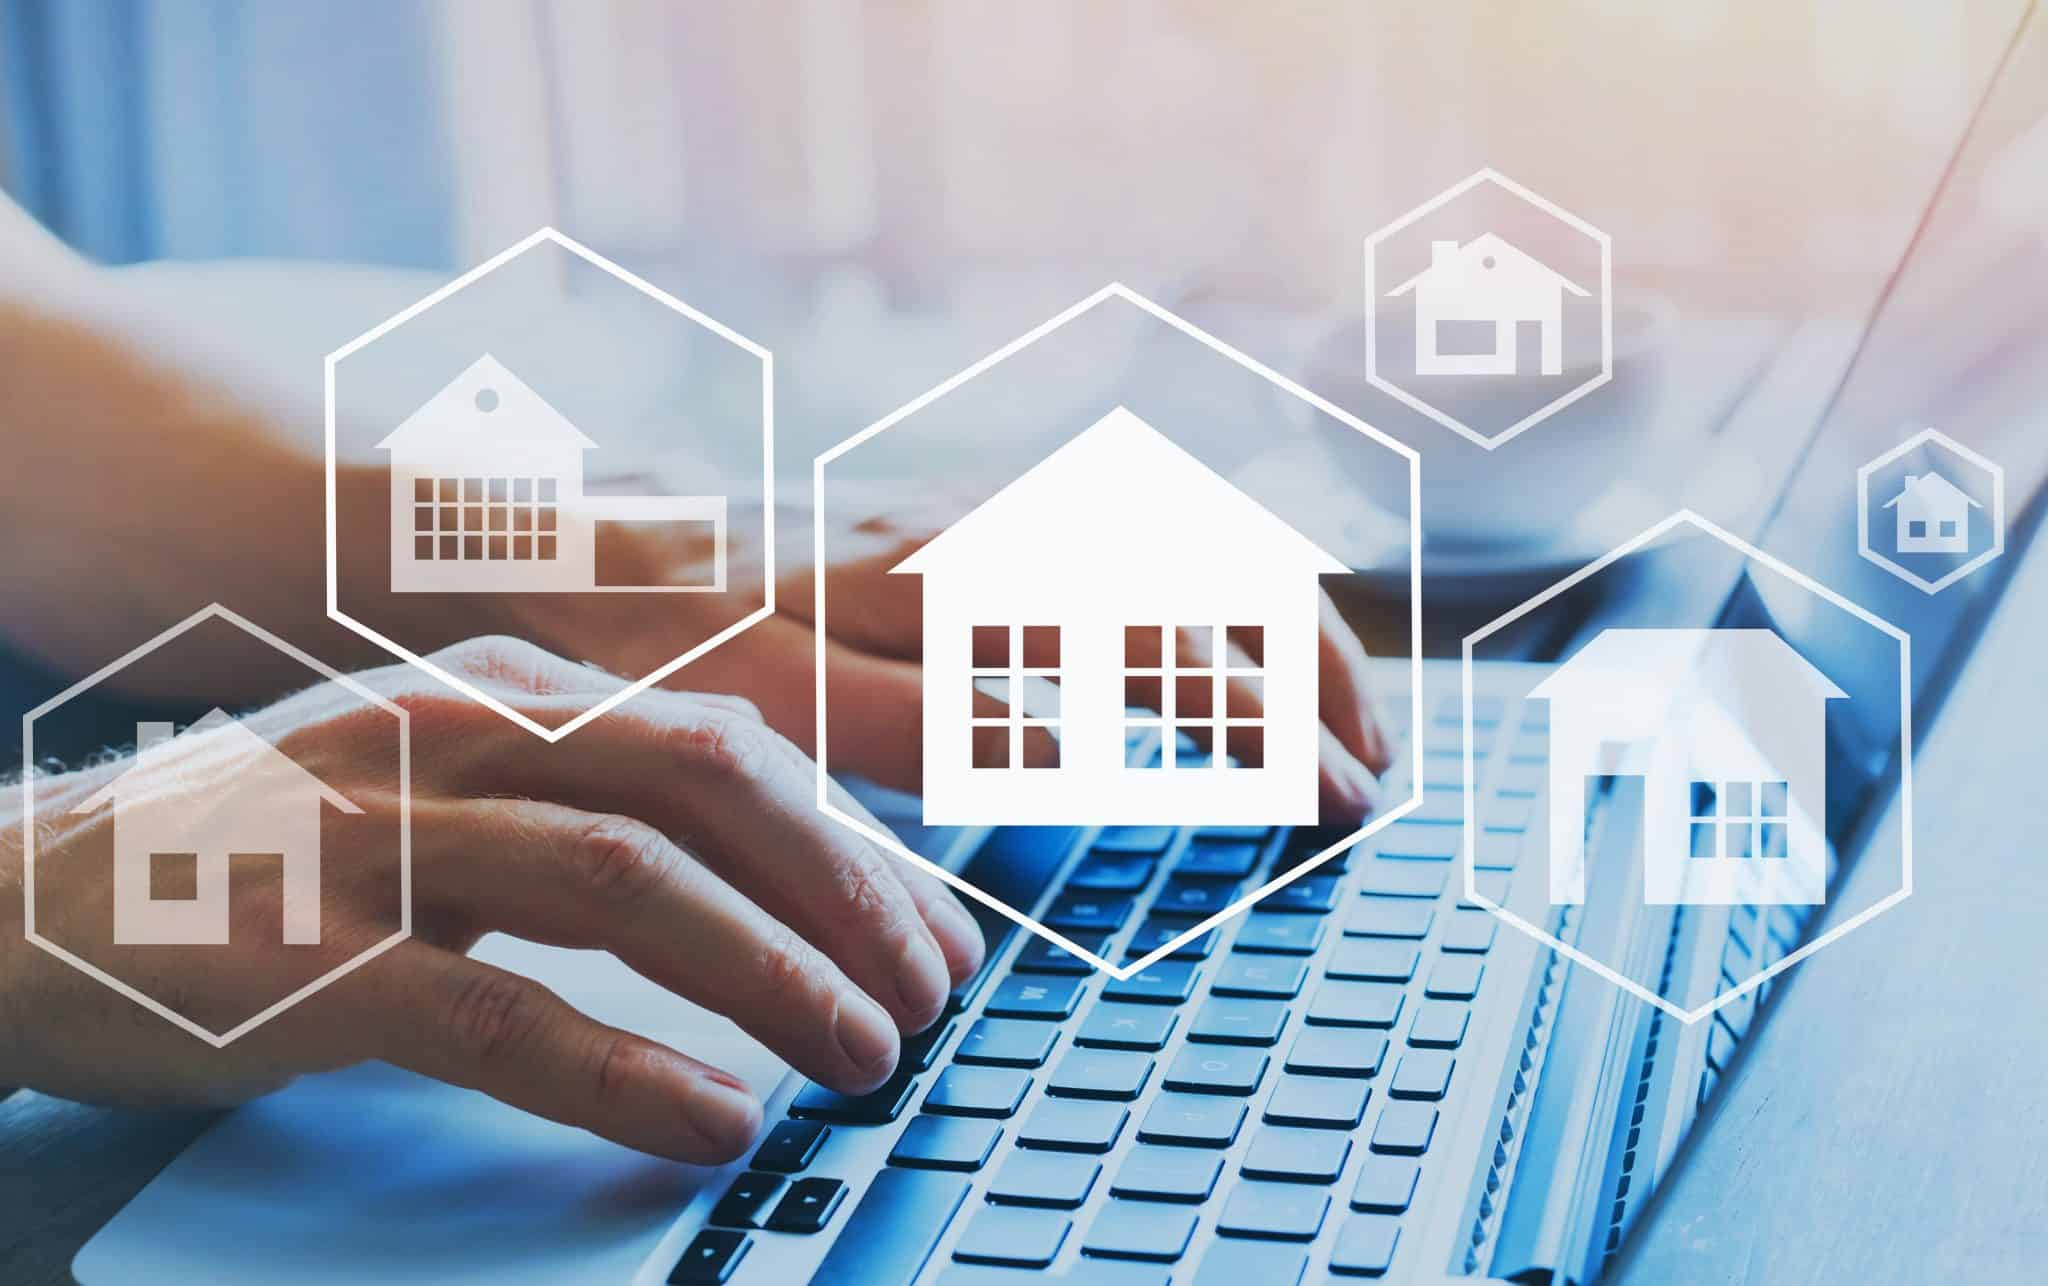 Home Rural Broadband